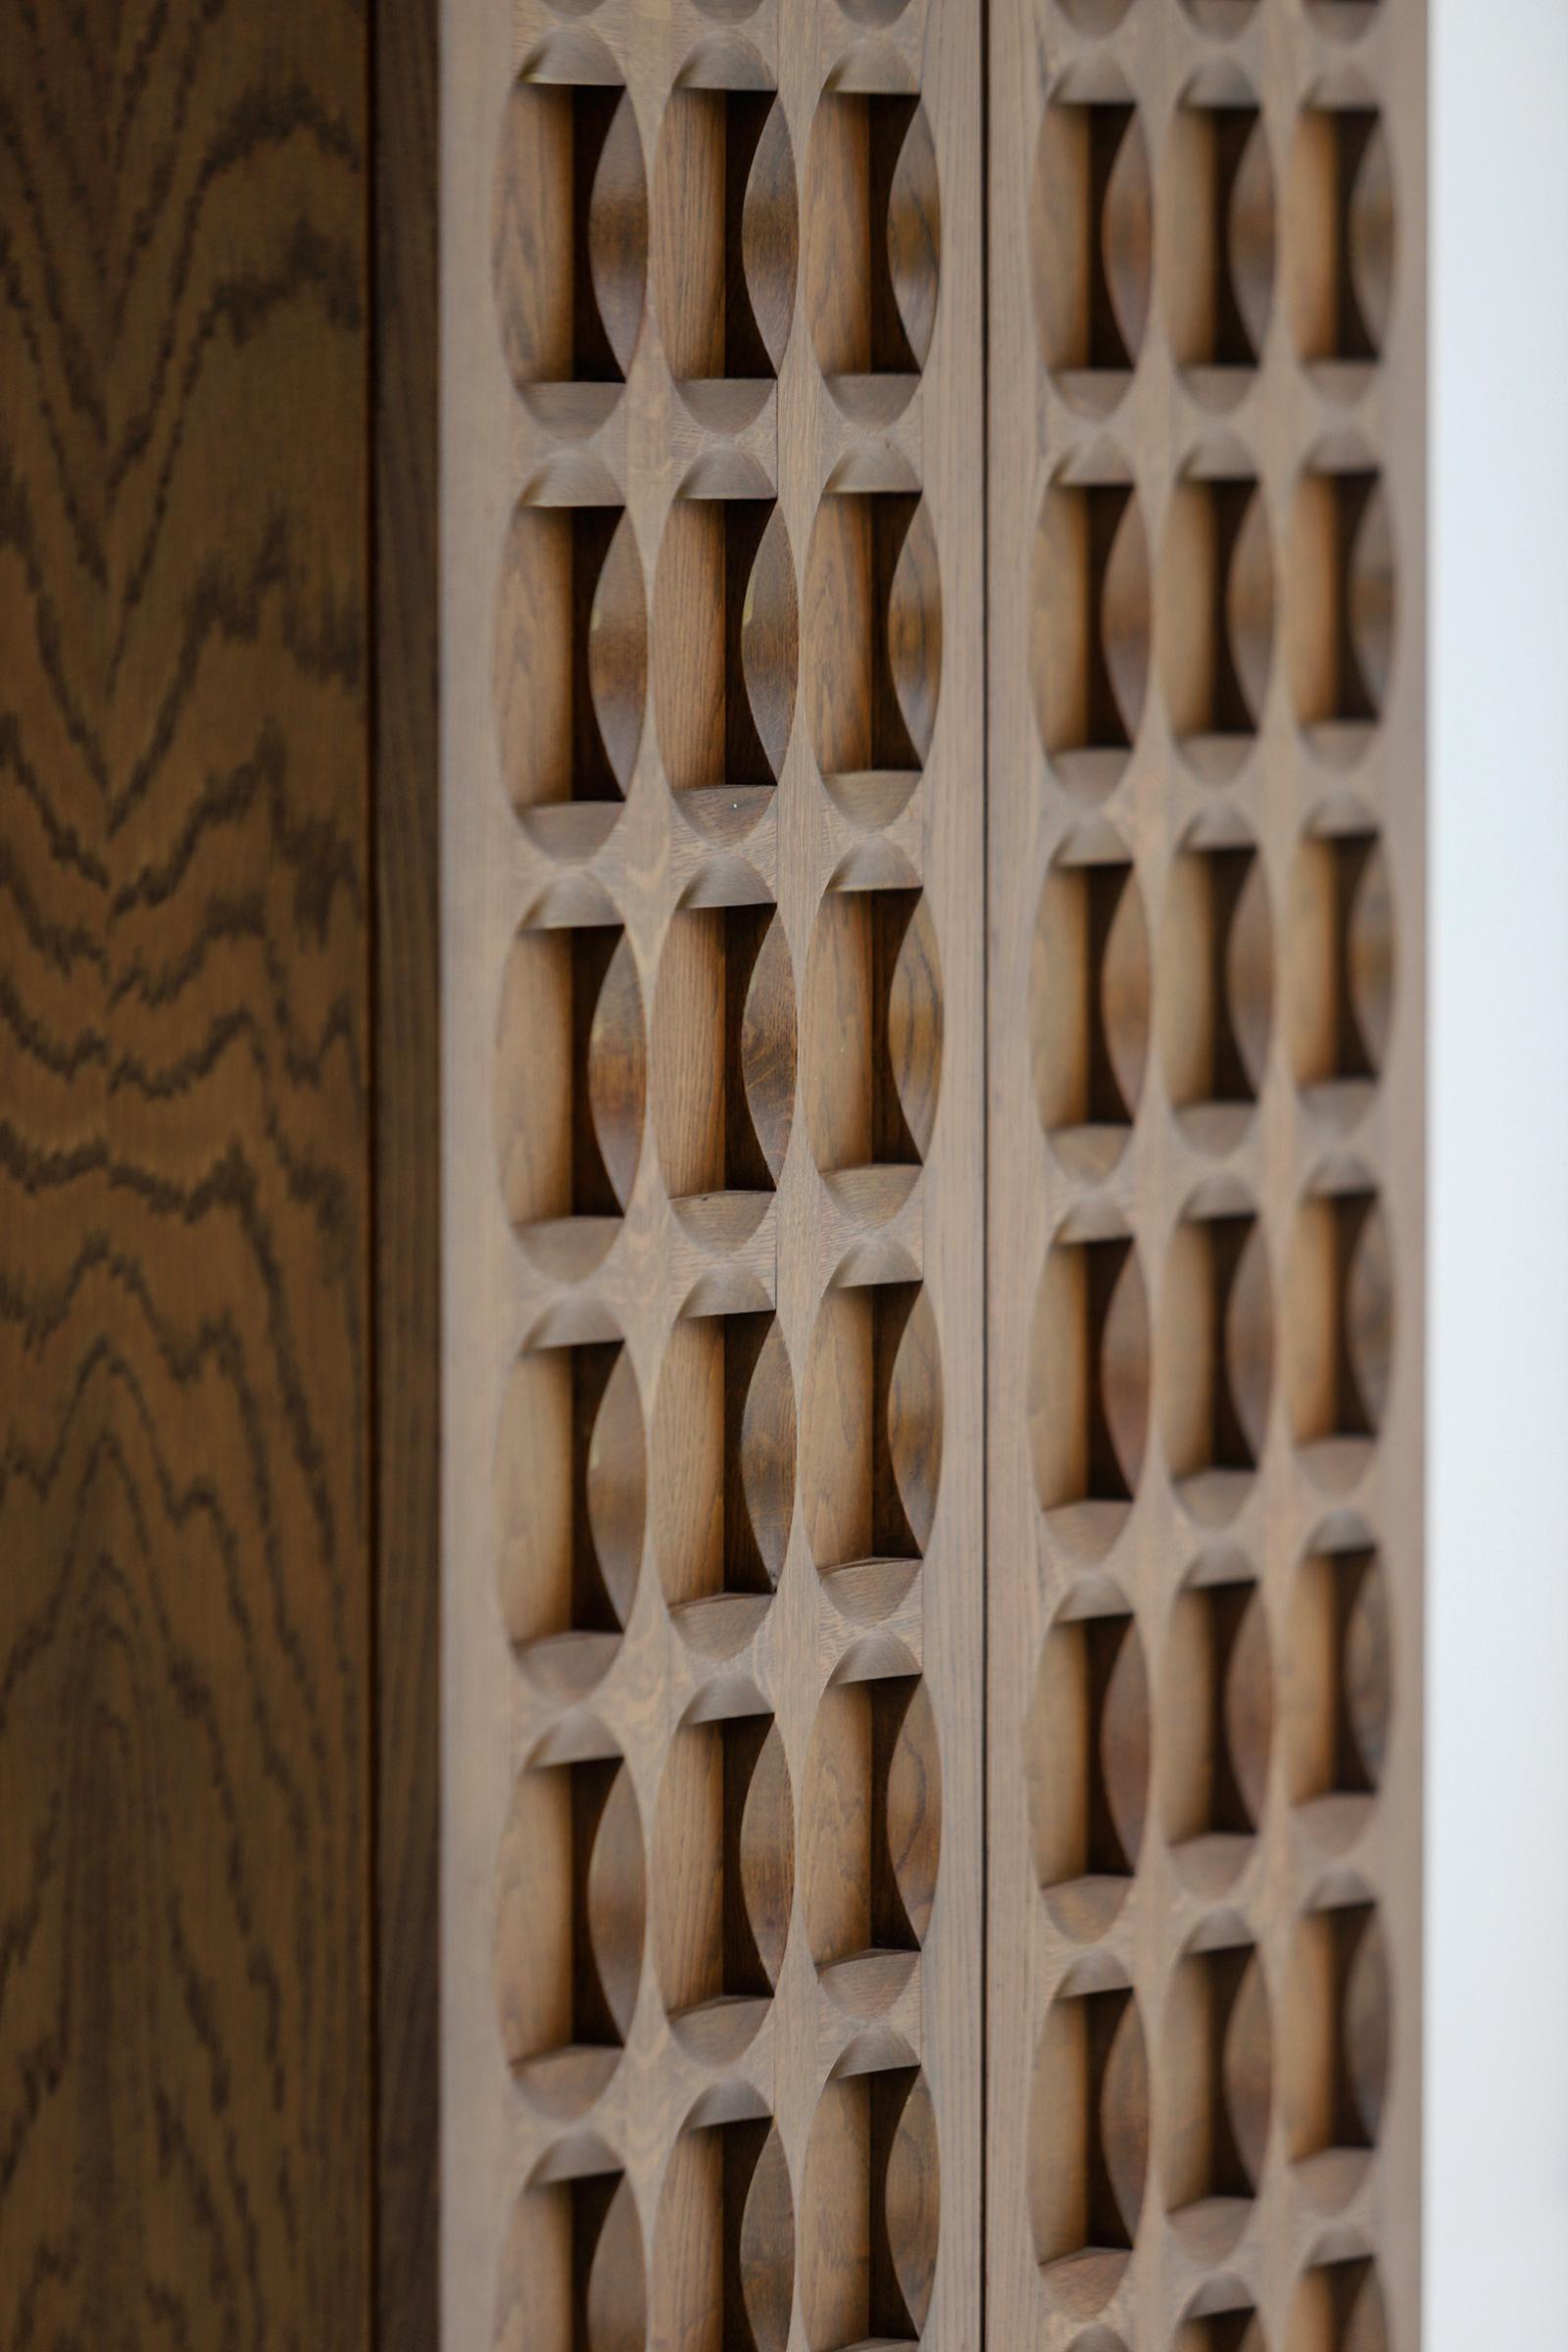 1970s Defour Cabinet Graphical Door Panels image 8